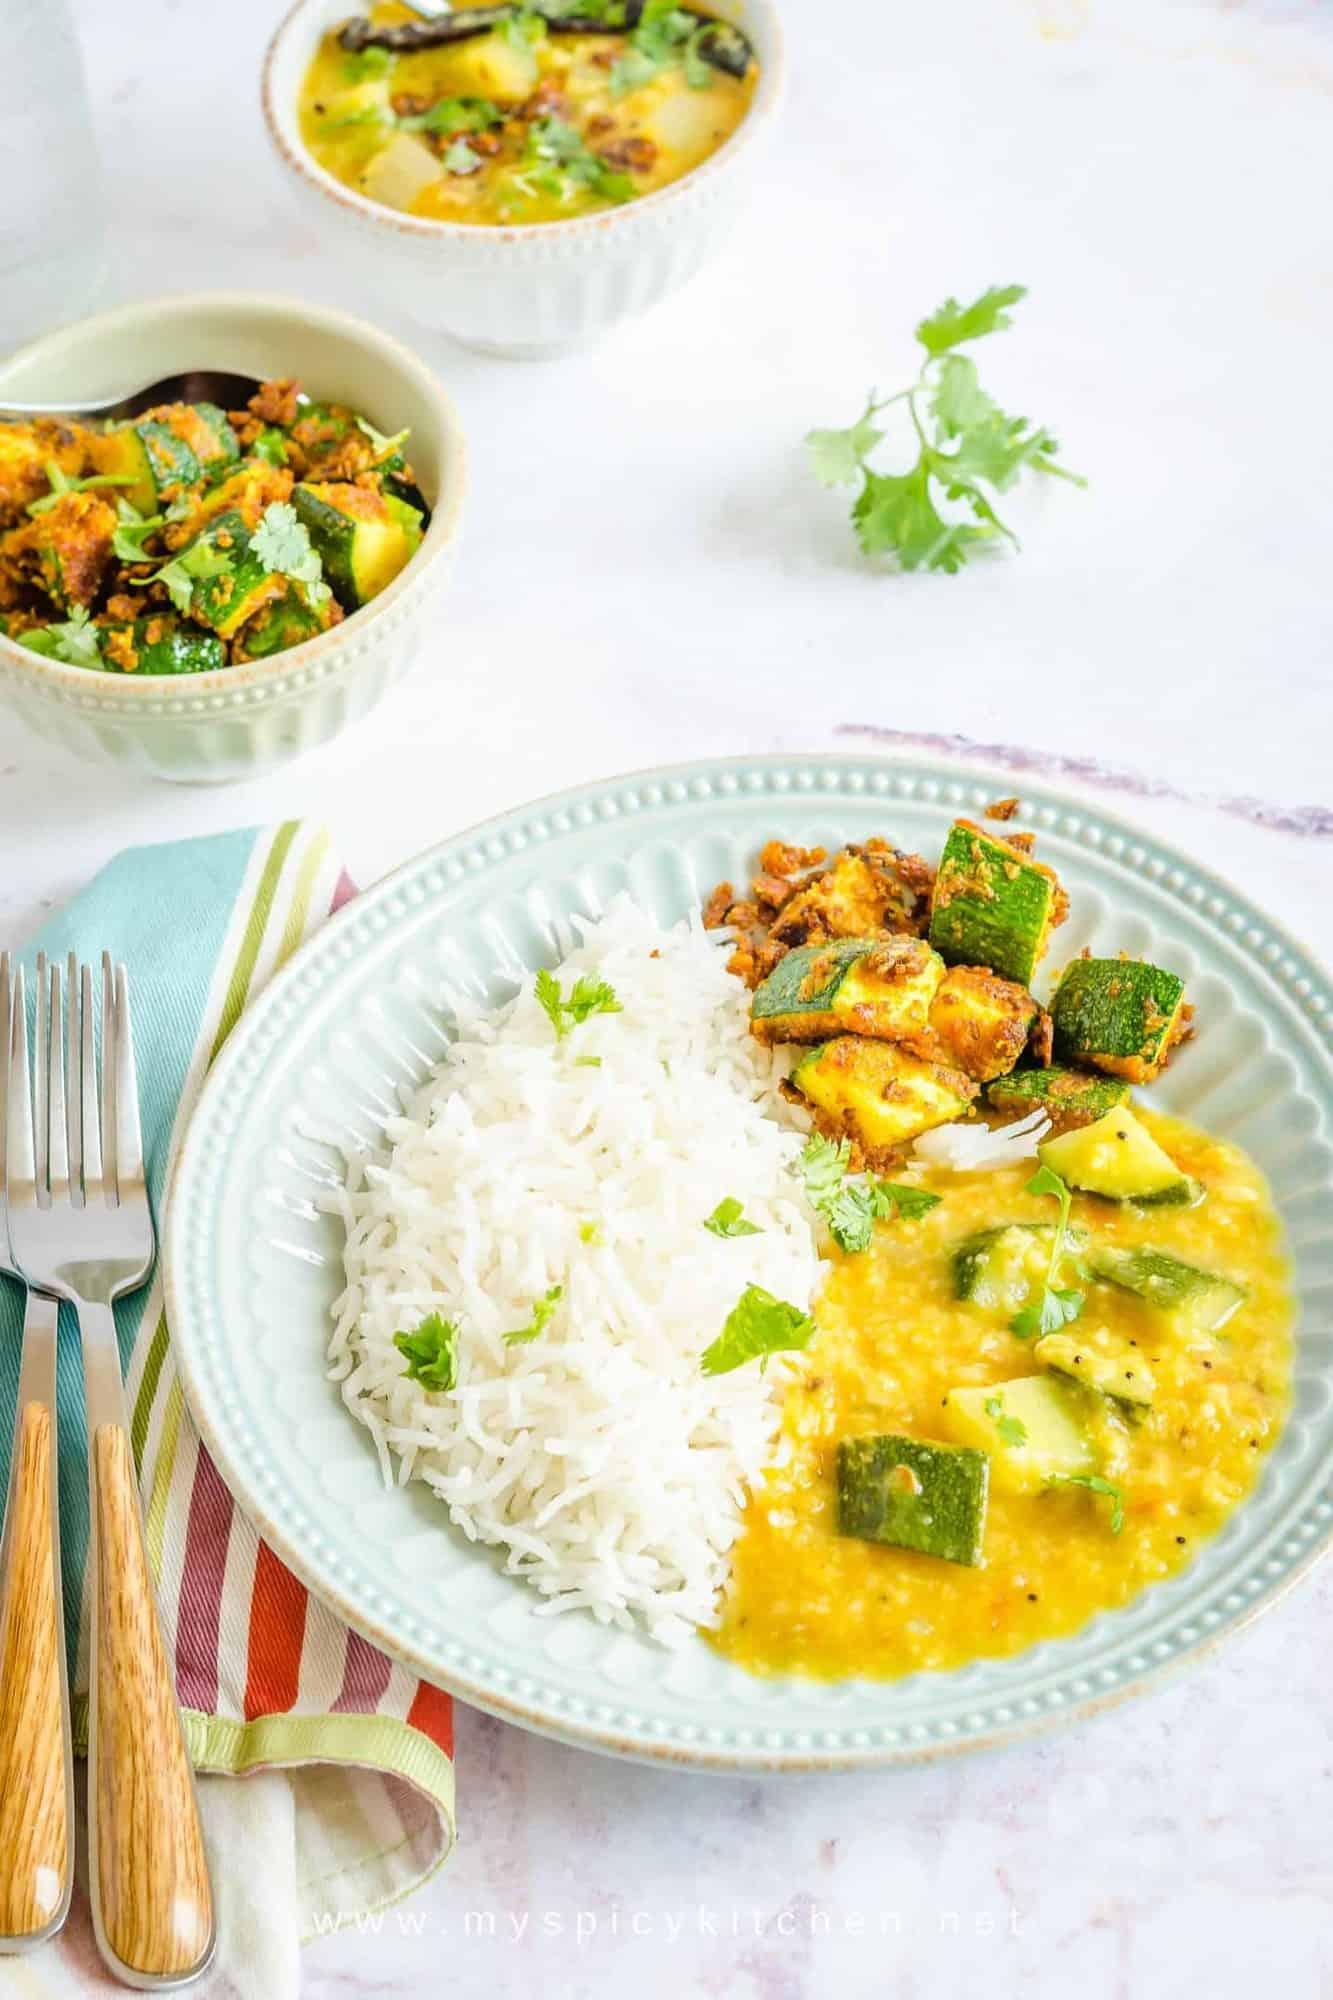 Plate of rice, zucchini dal and zucchini stir fry